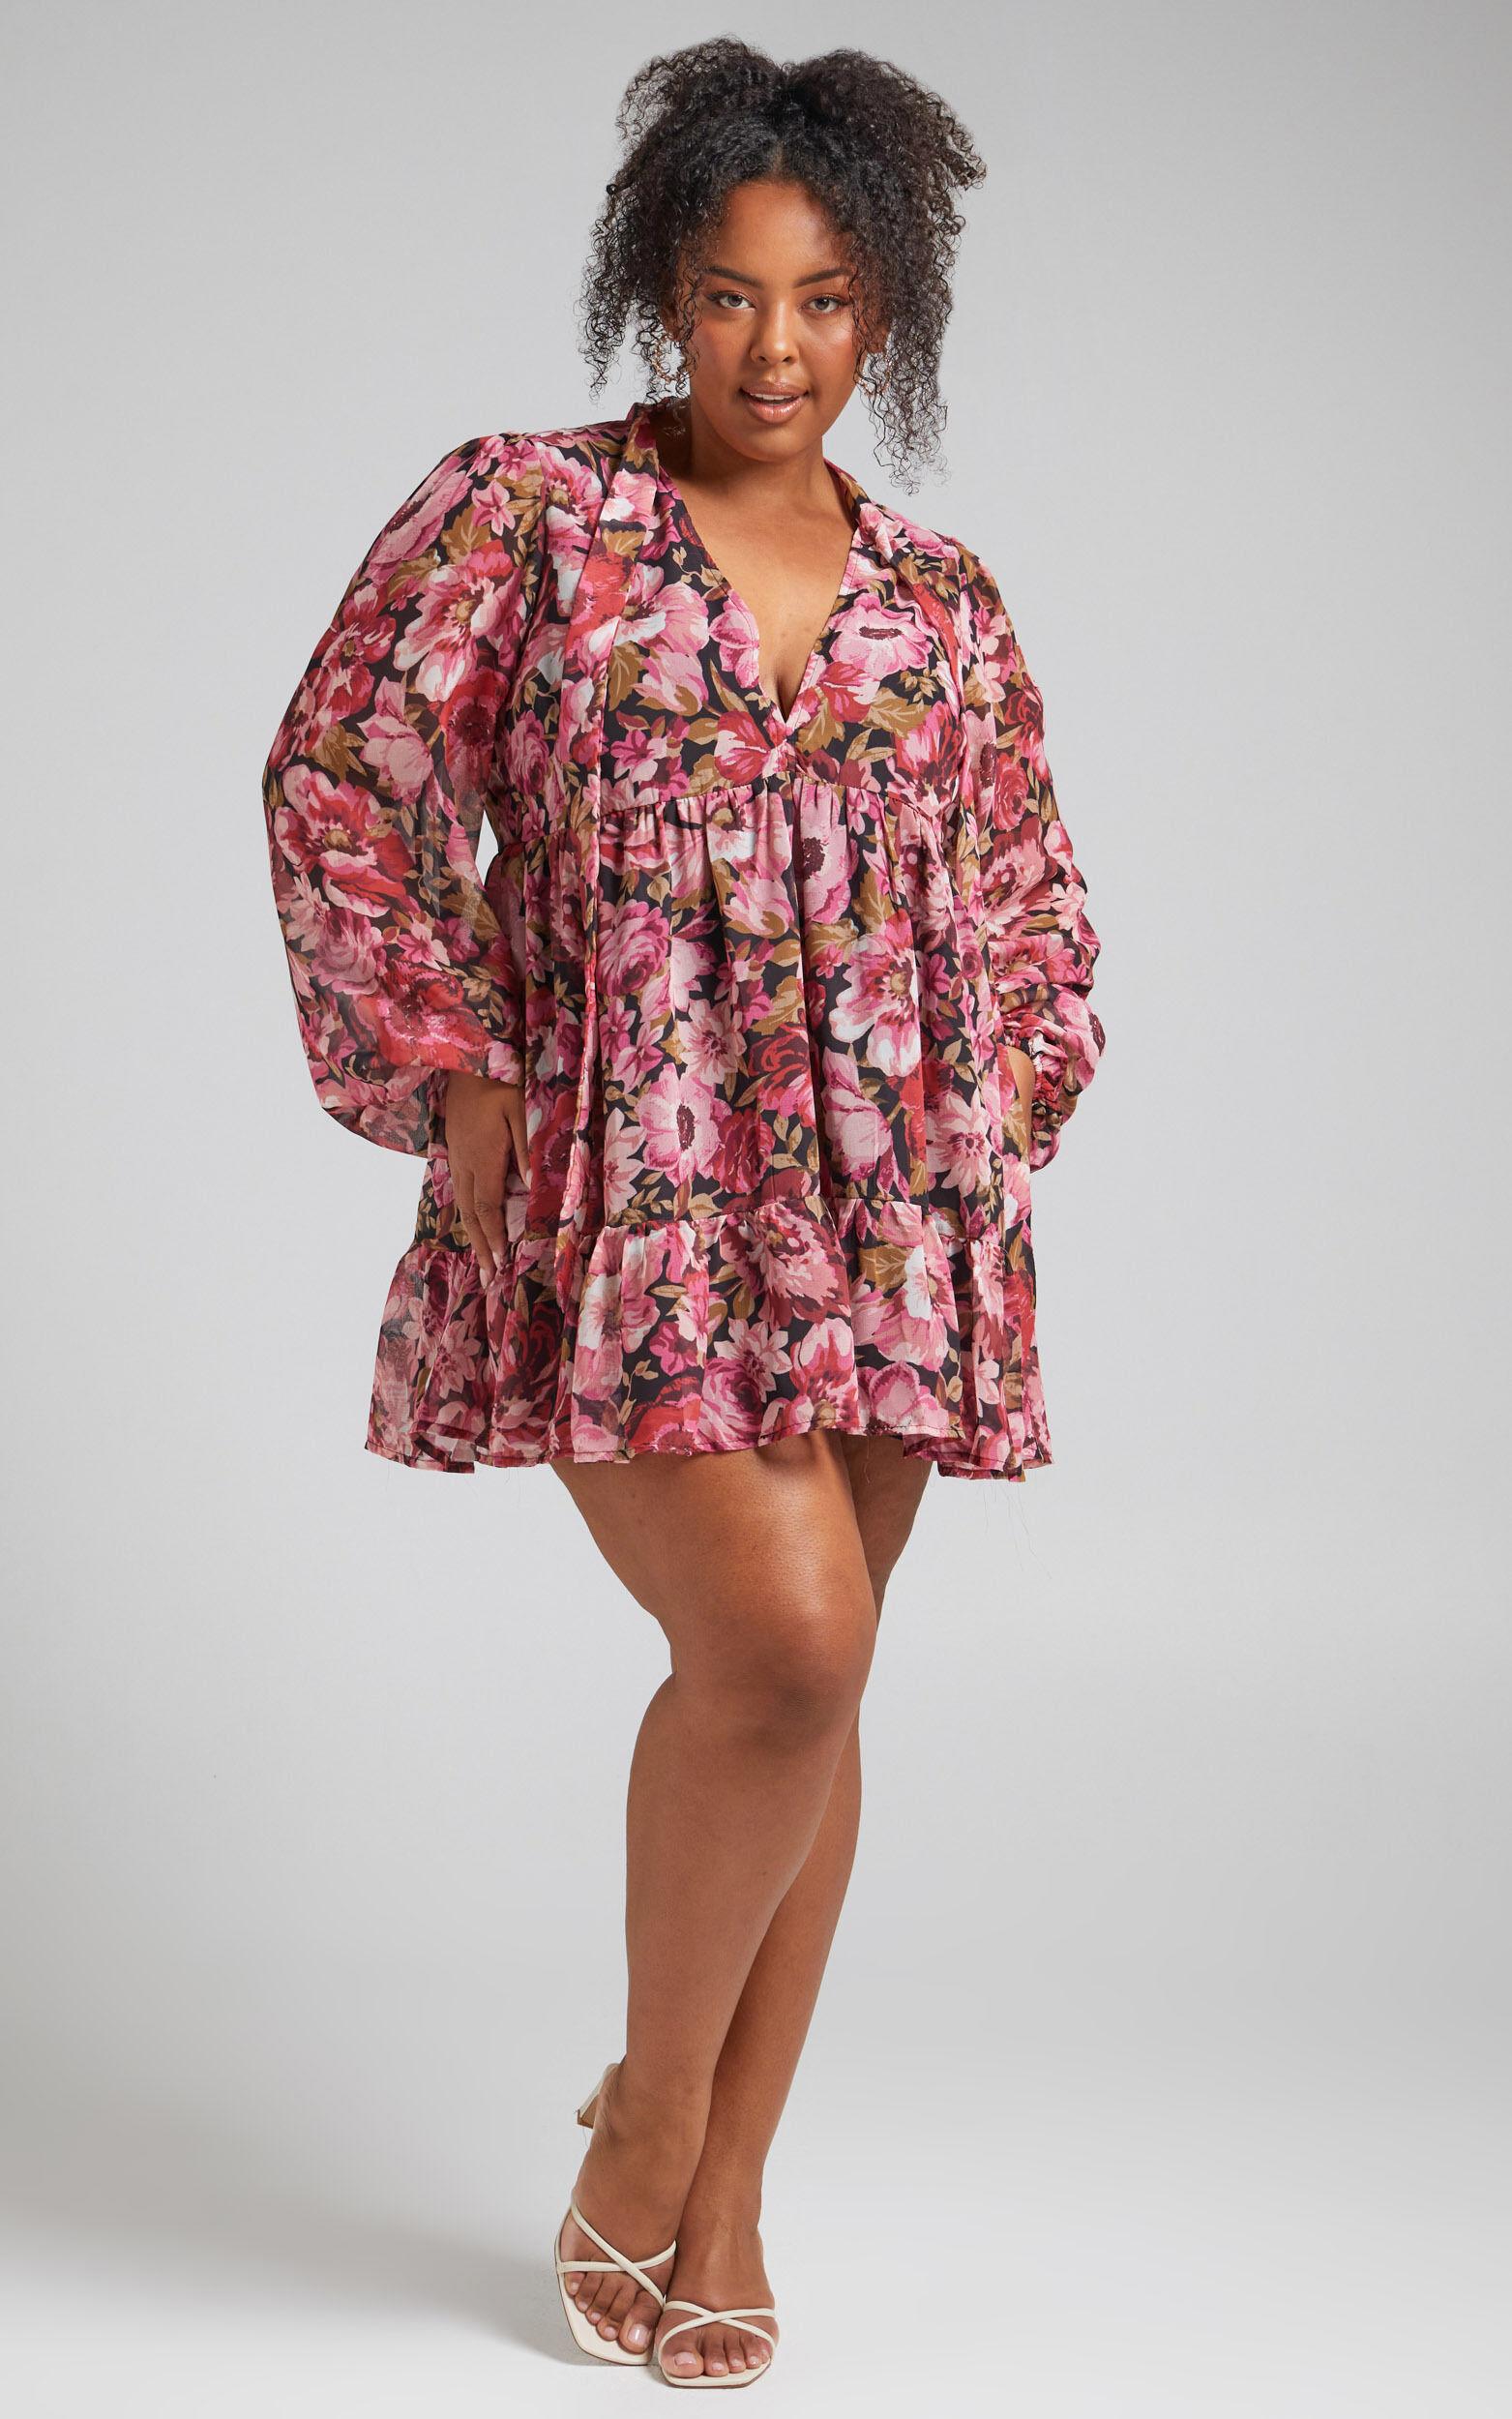 Janessa Tie Front Shift Mini Dress in Boudoir Blooms - 04, PNK1, super-hi-res image number null